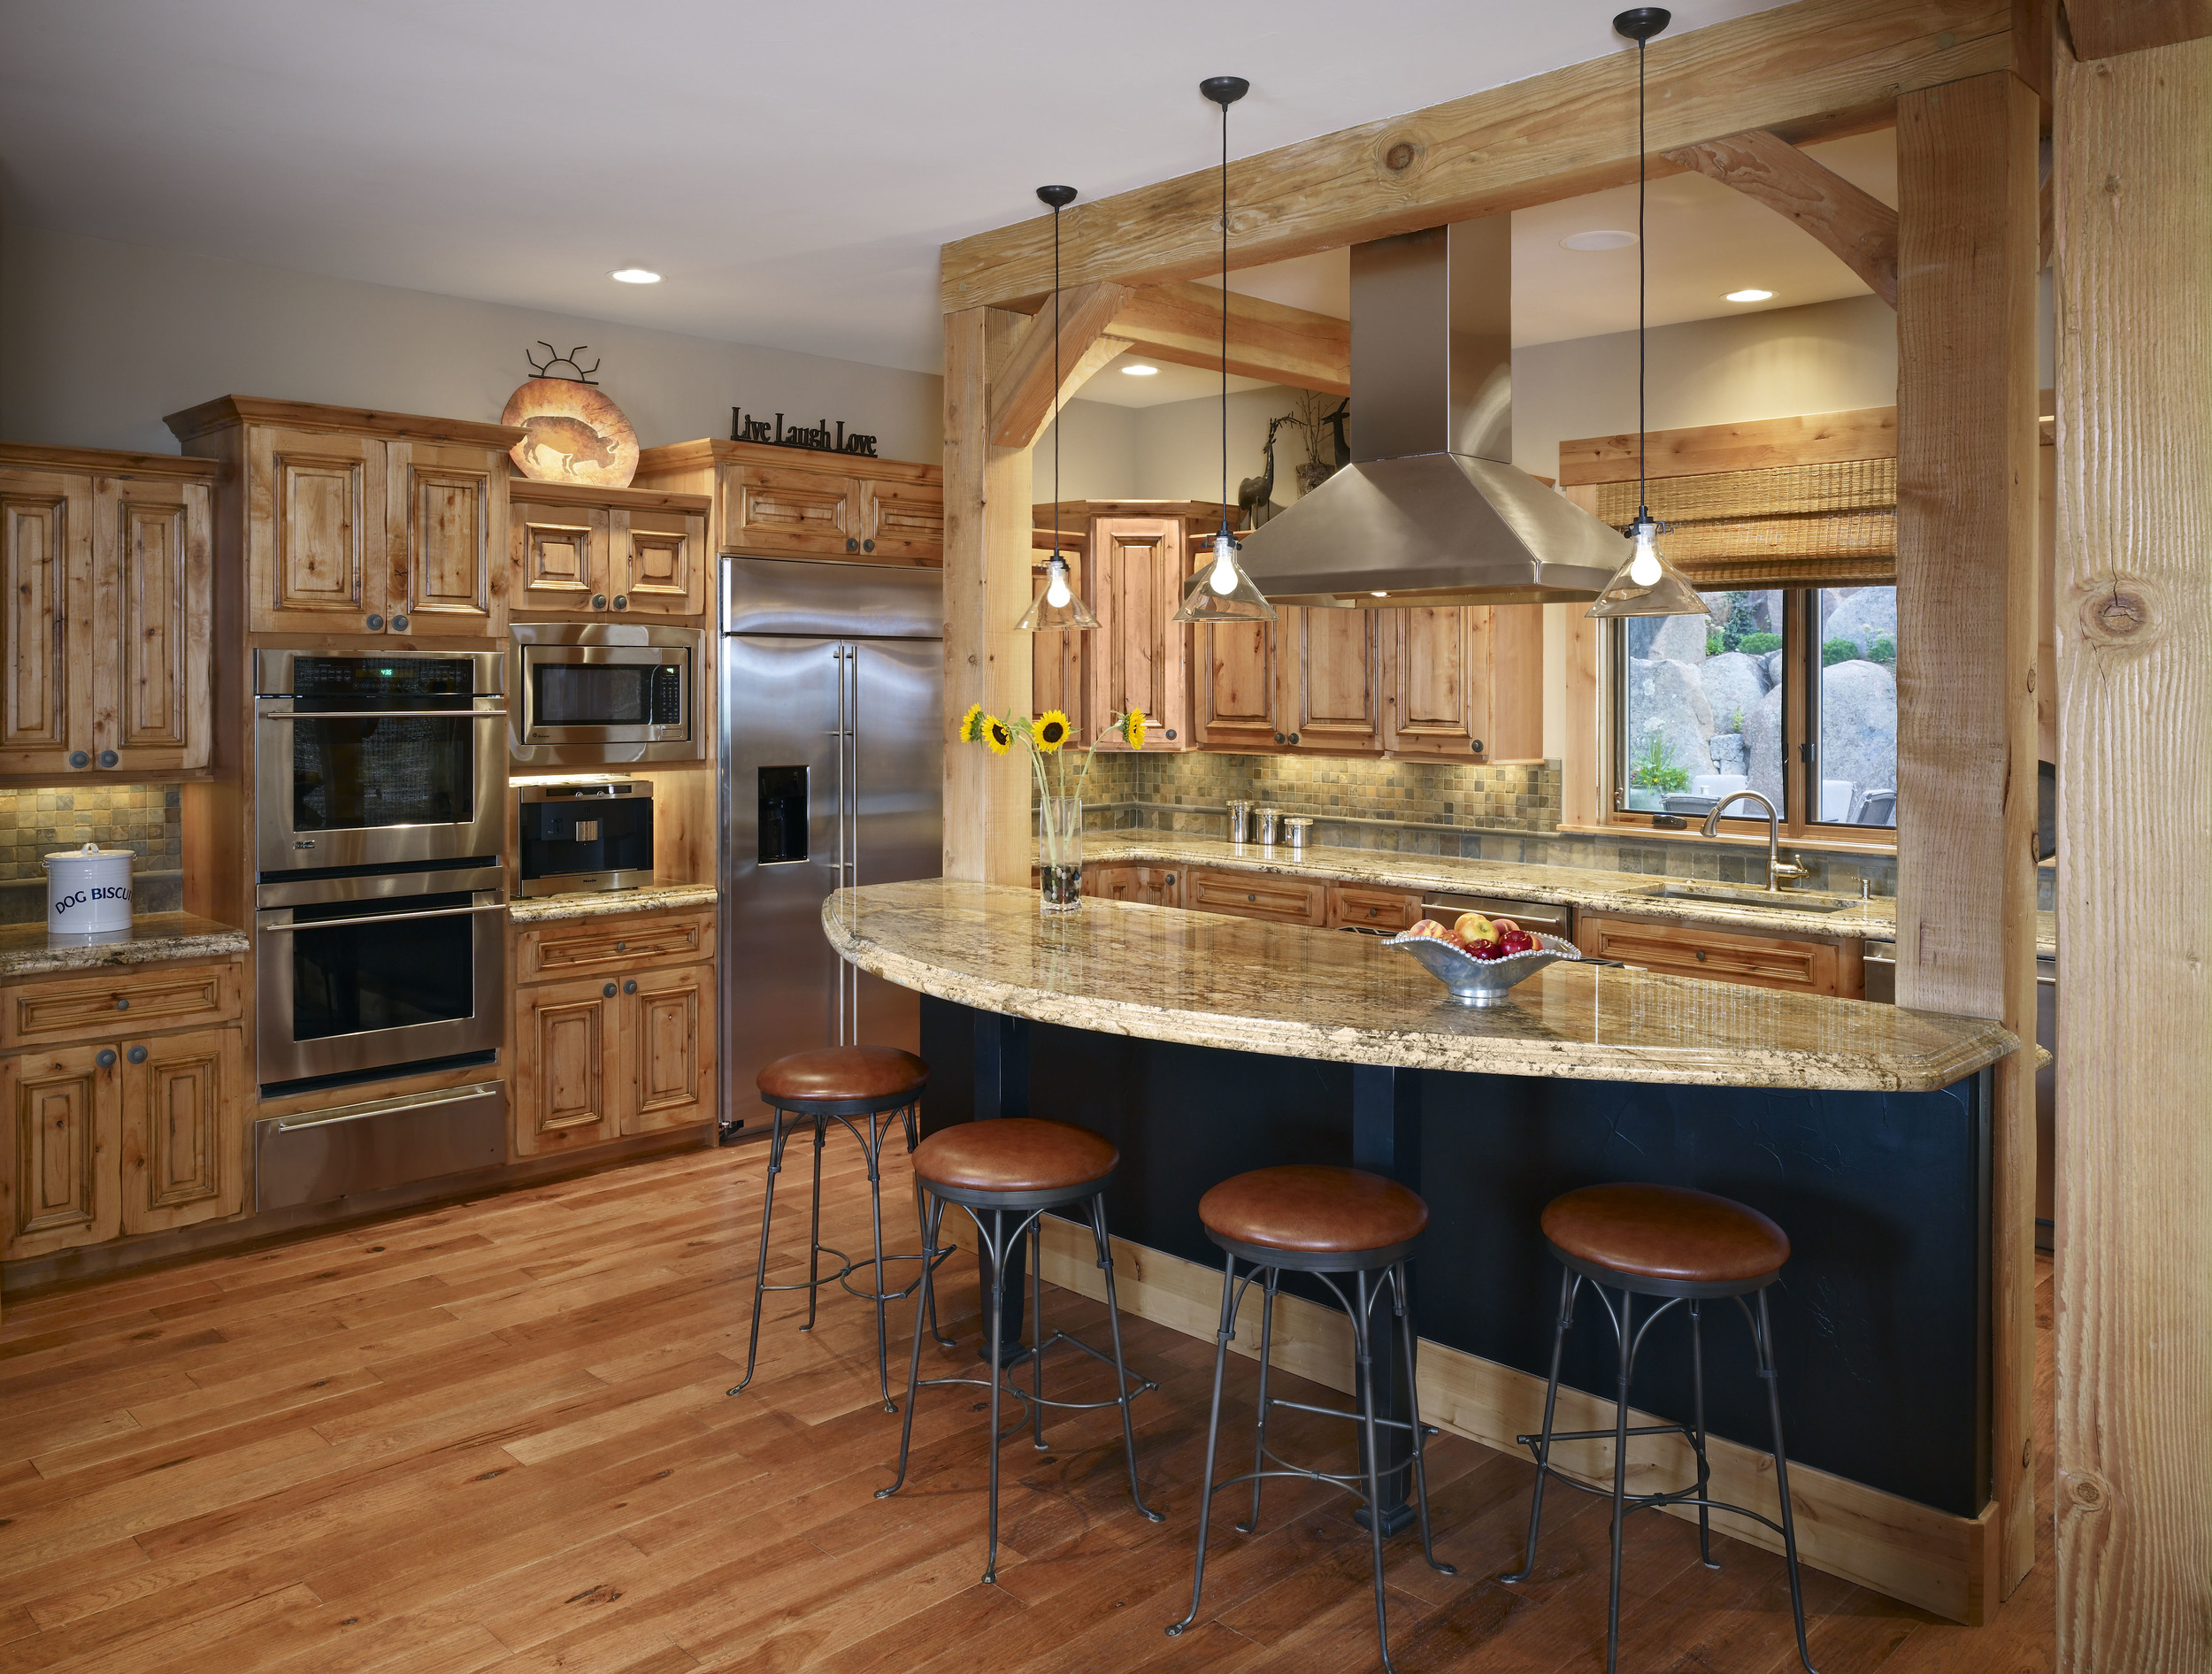 Gamble kitchen.jpg